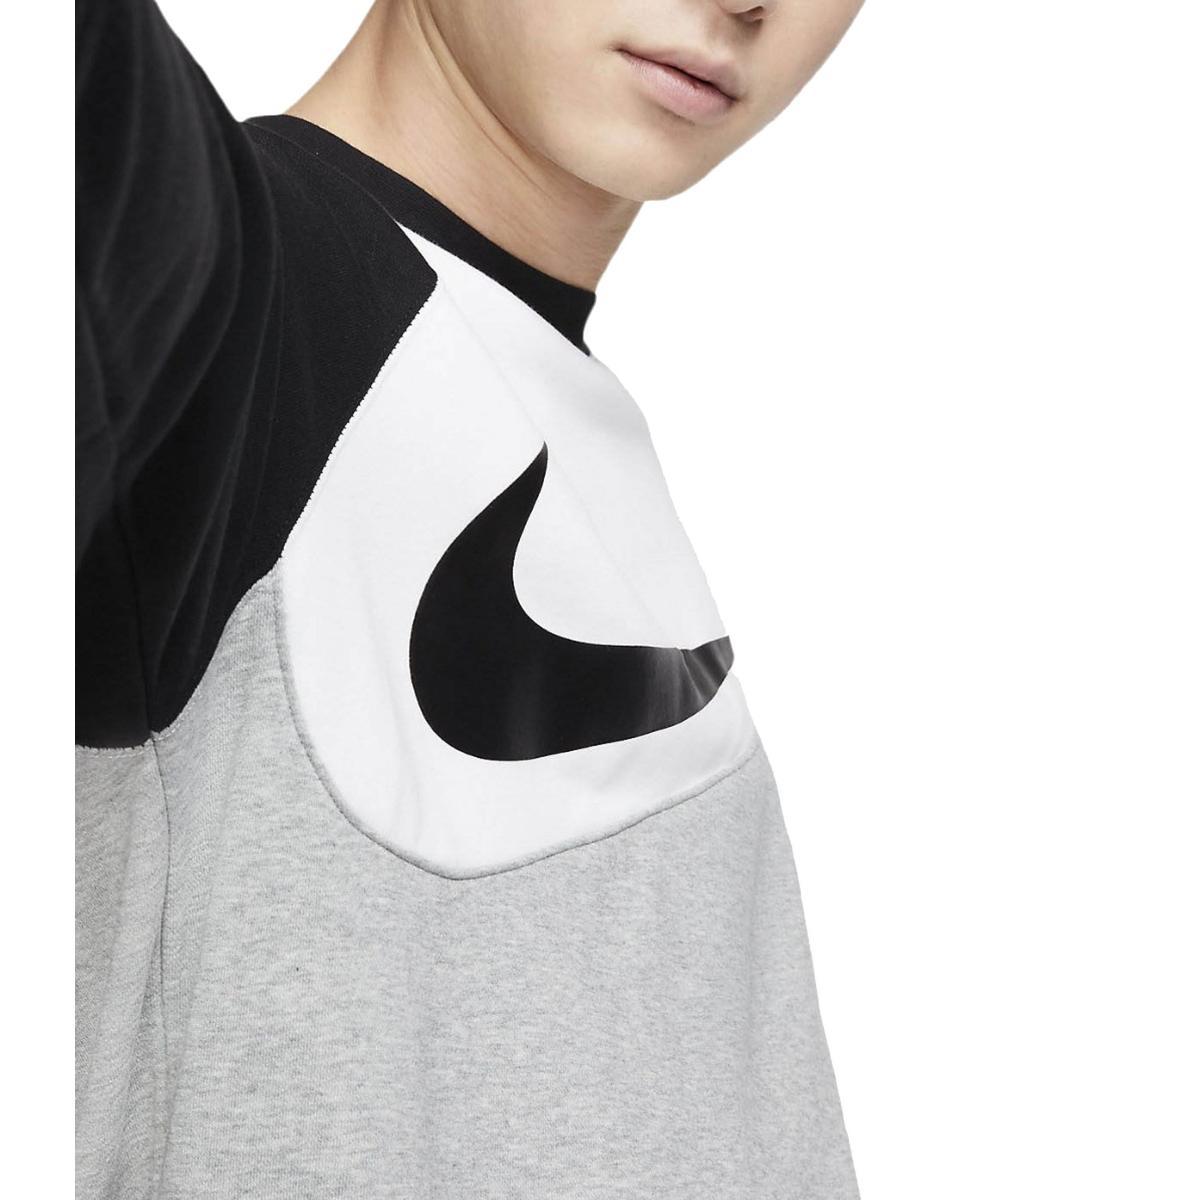 Felpa Nike NSW Swoosh crew fit girocollo con stampa da uomo rif. BV5304